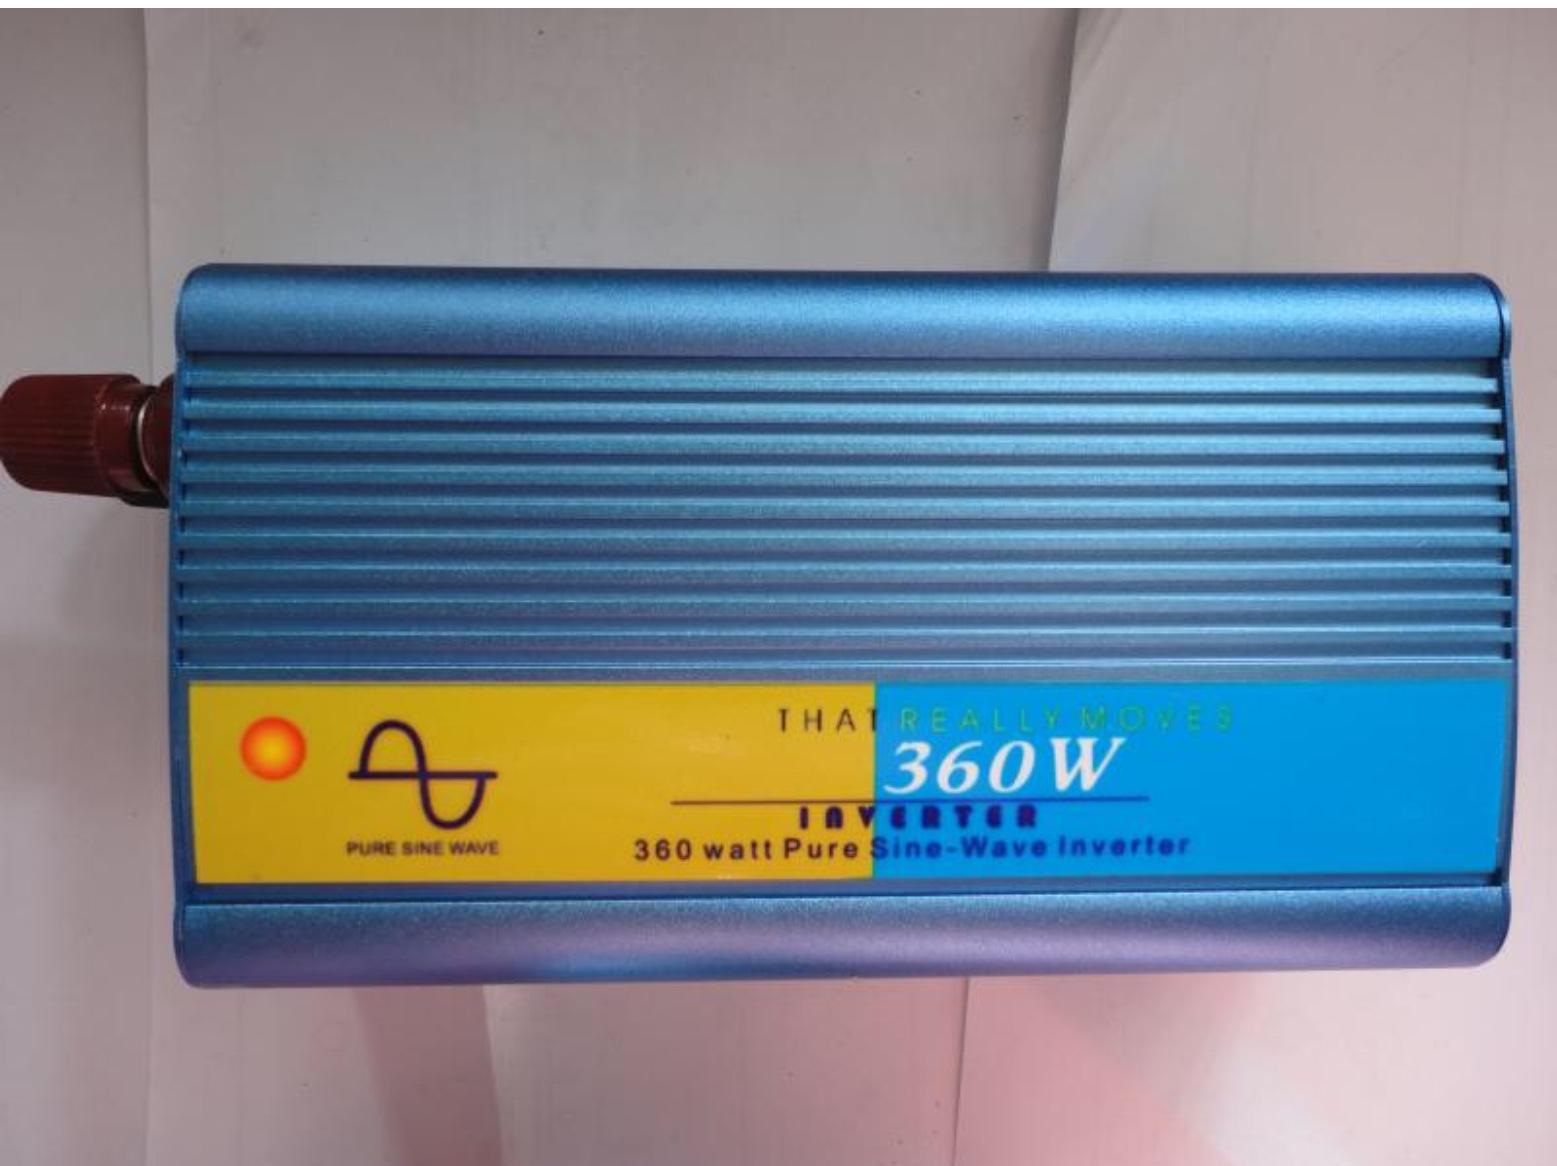 Pure sine wave inverter โดยใช้ EGS002 Driver board